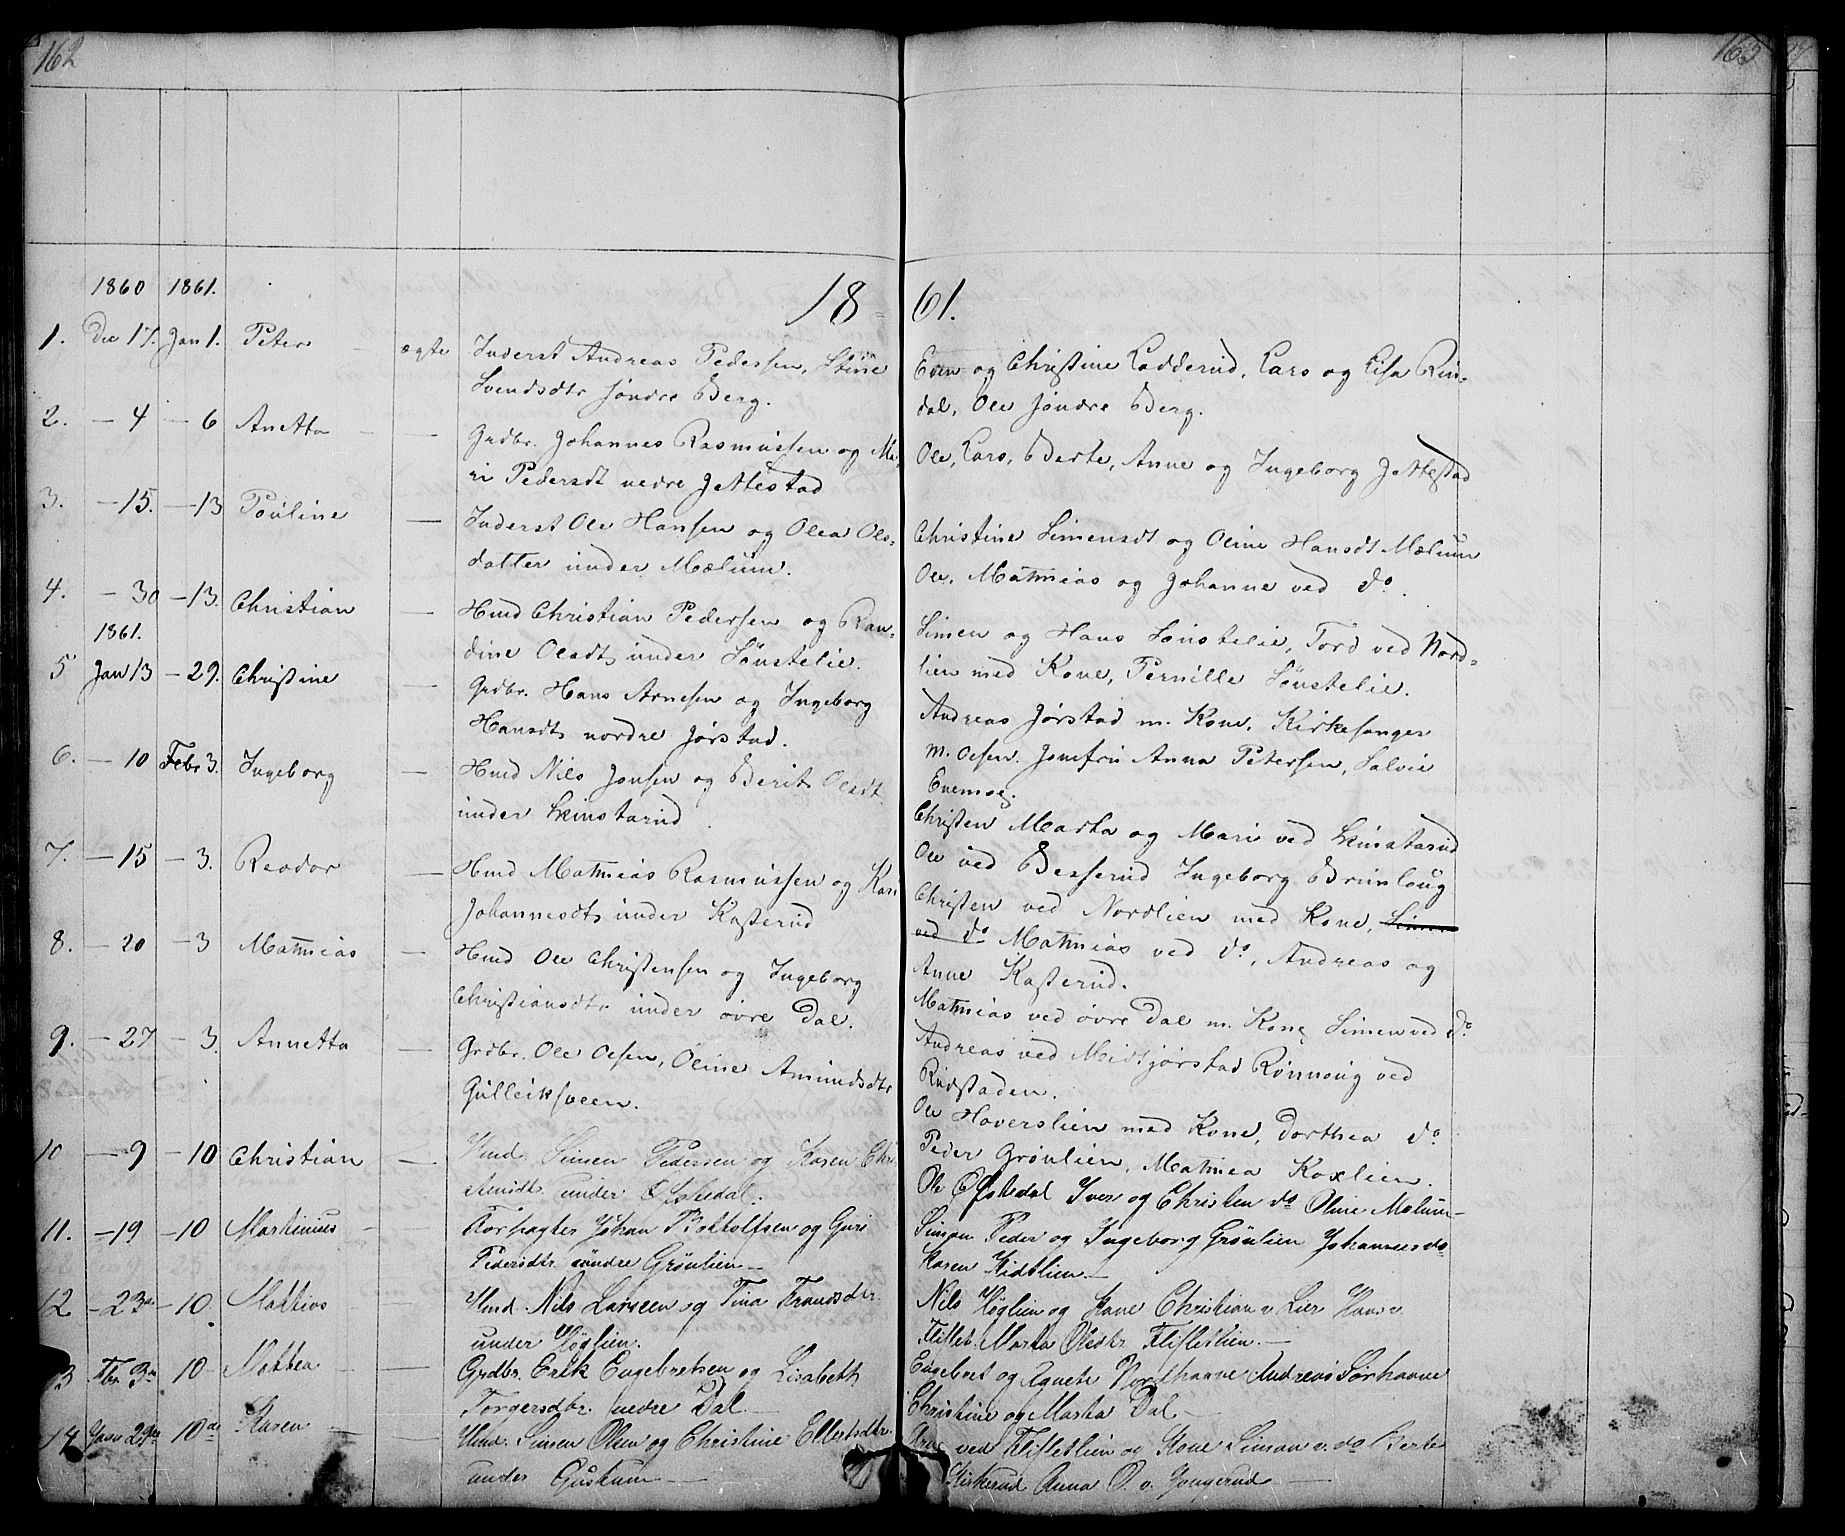 SAH, Fåberg prestekontor, Klokkerbok nr. 5, 1837-1864, s. 162-163